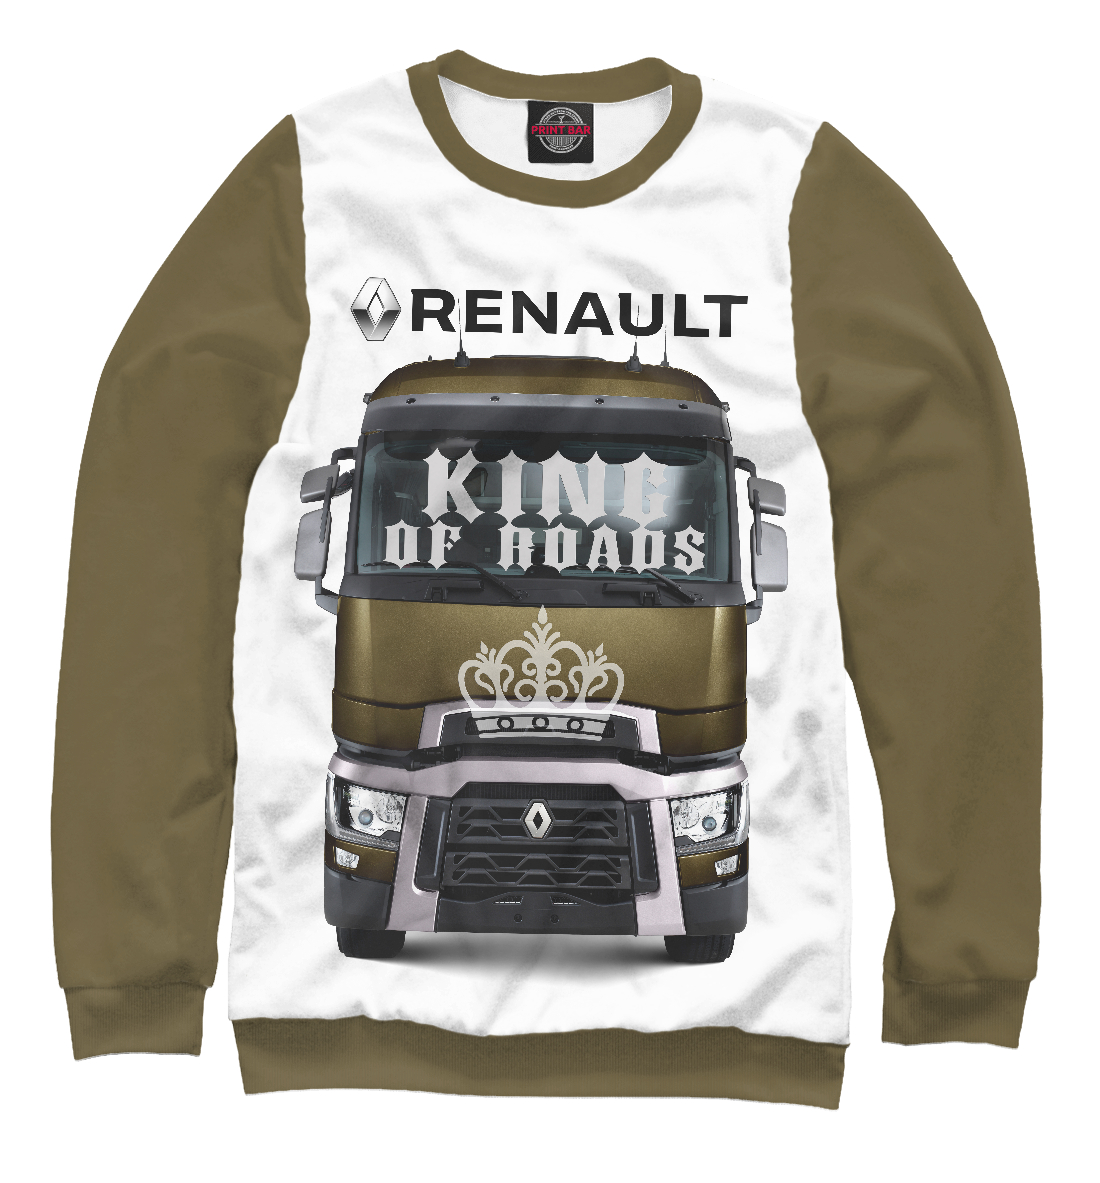 Купить RENAULT - король дорог, Printbar, Свитшоты, GRZ-918078-swi-1